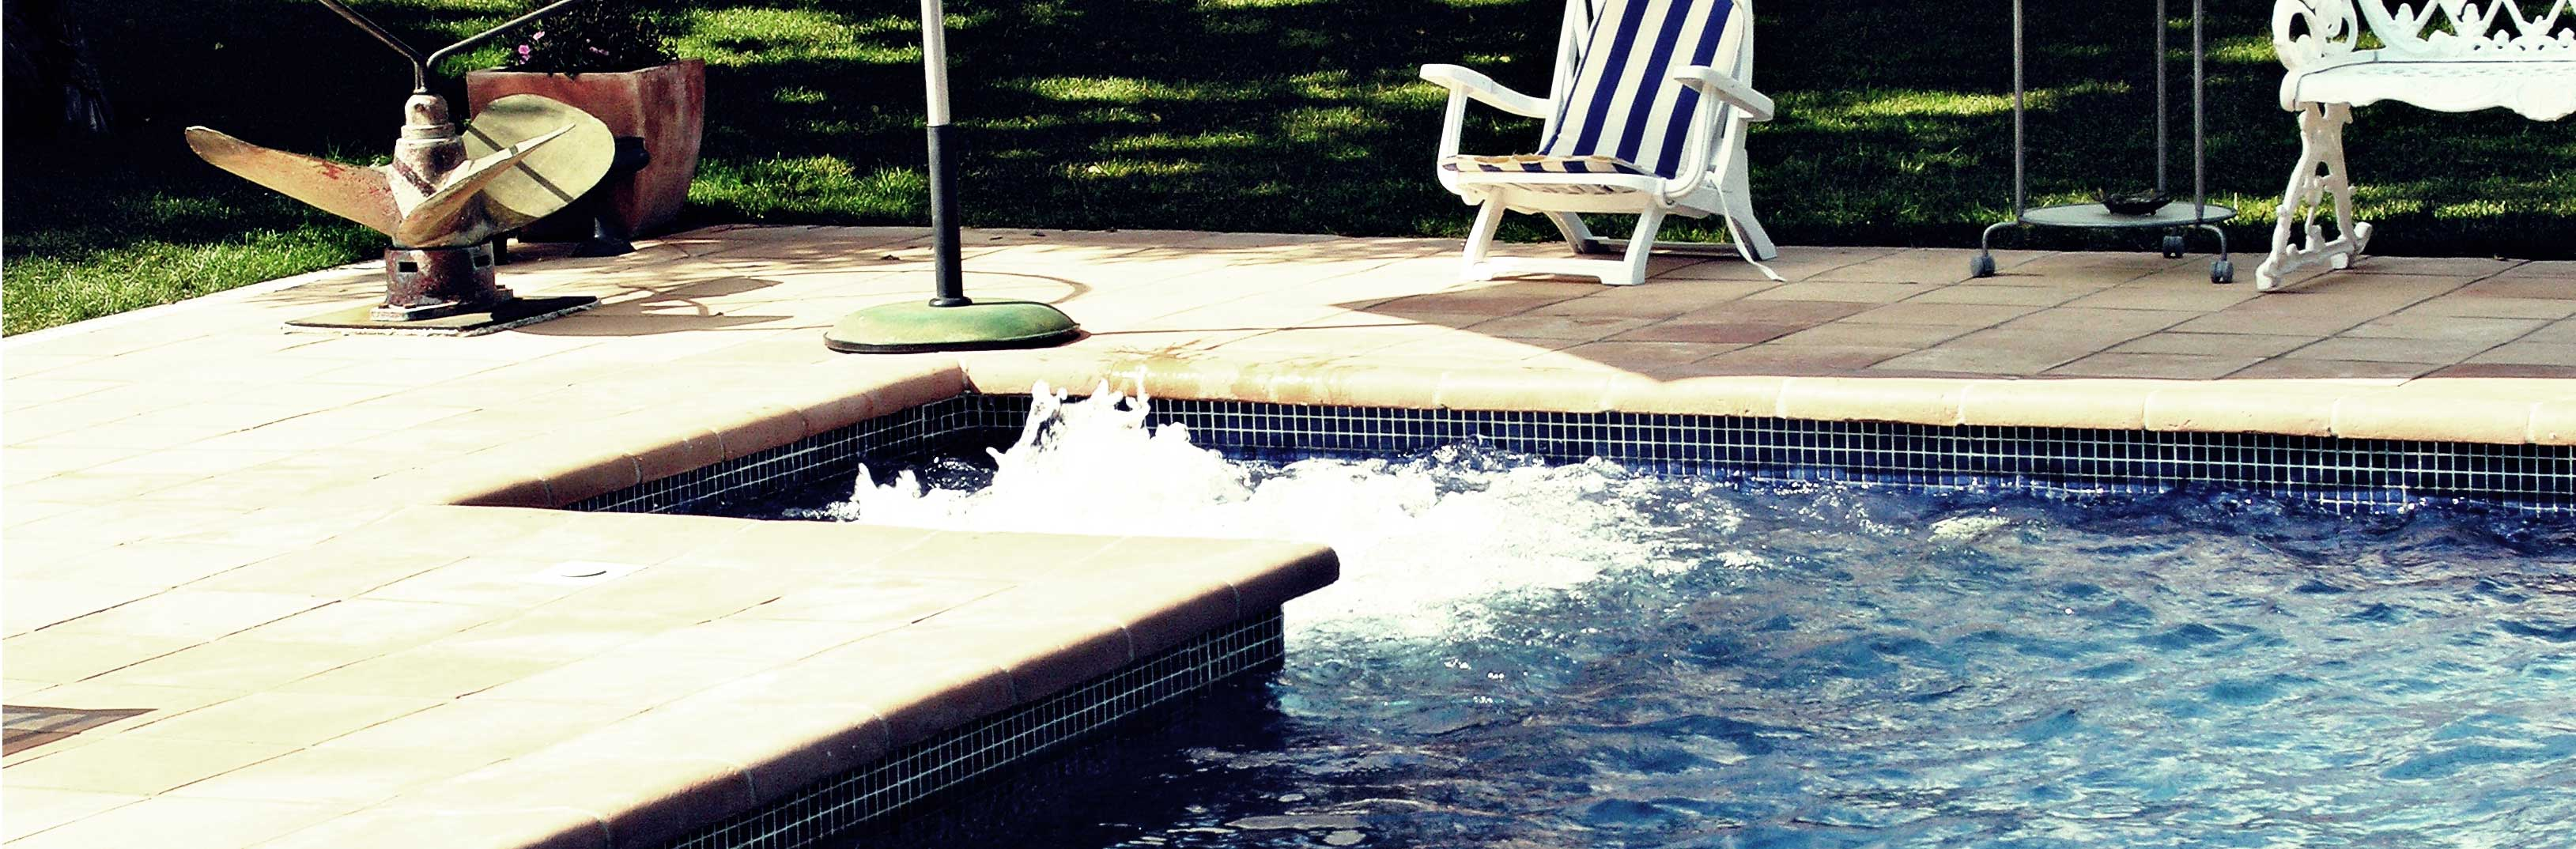 aguaviva-piscinas-sli-08